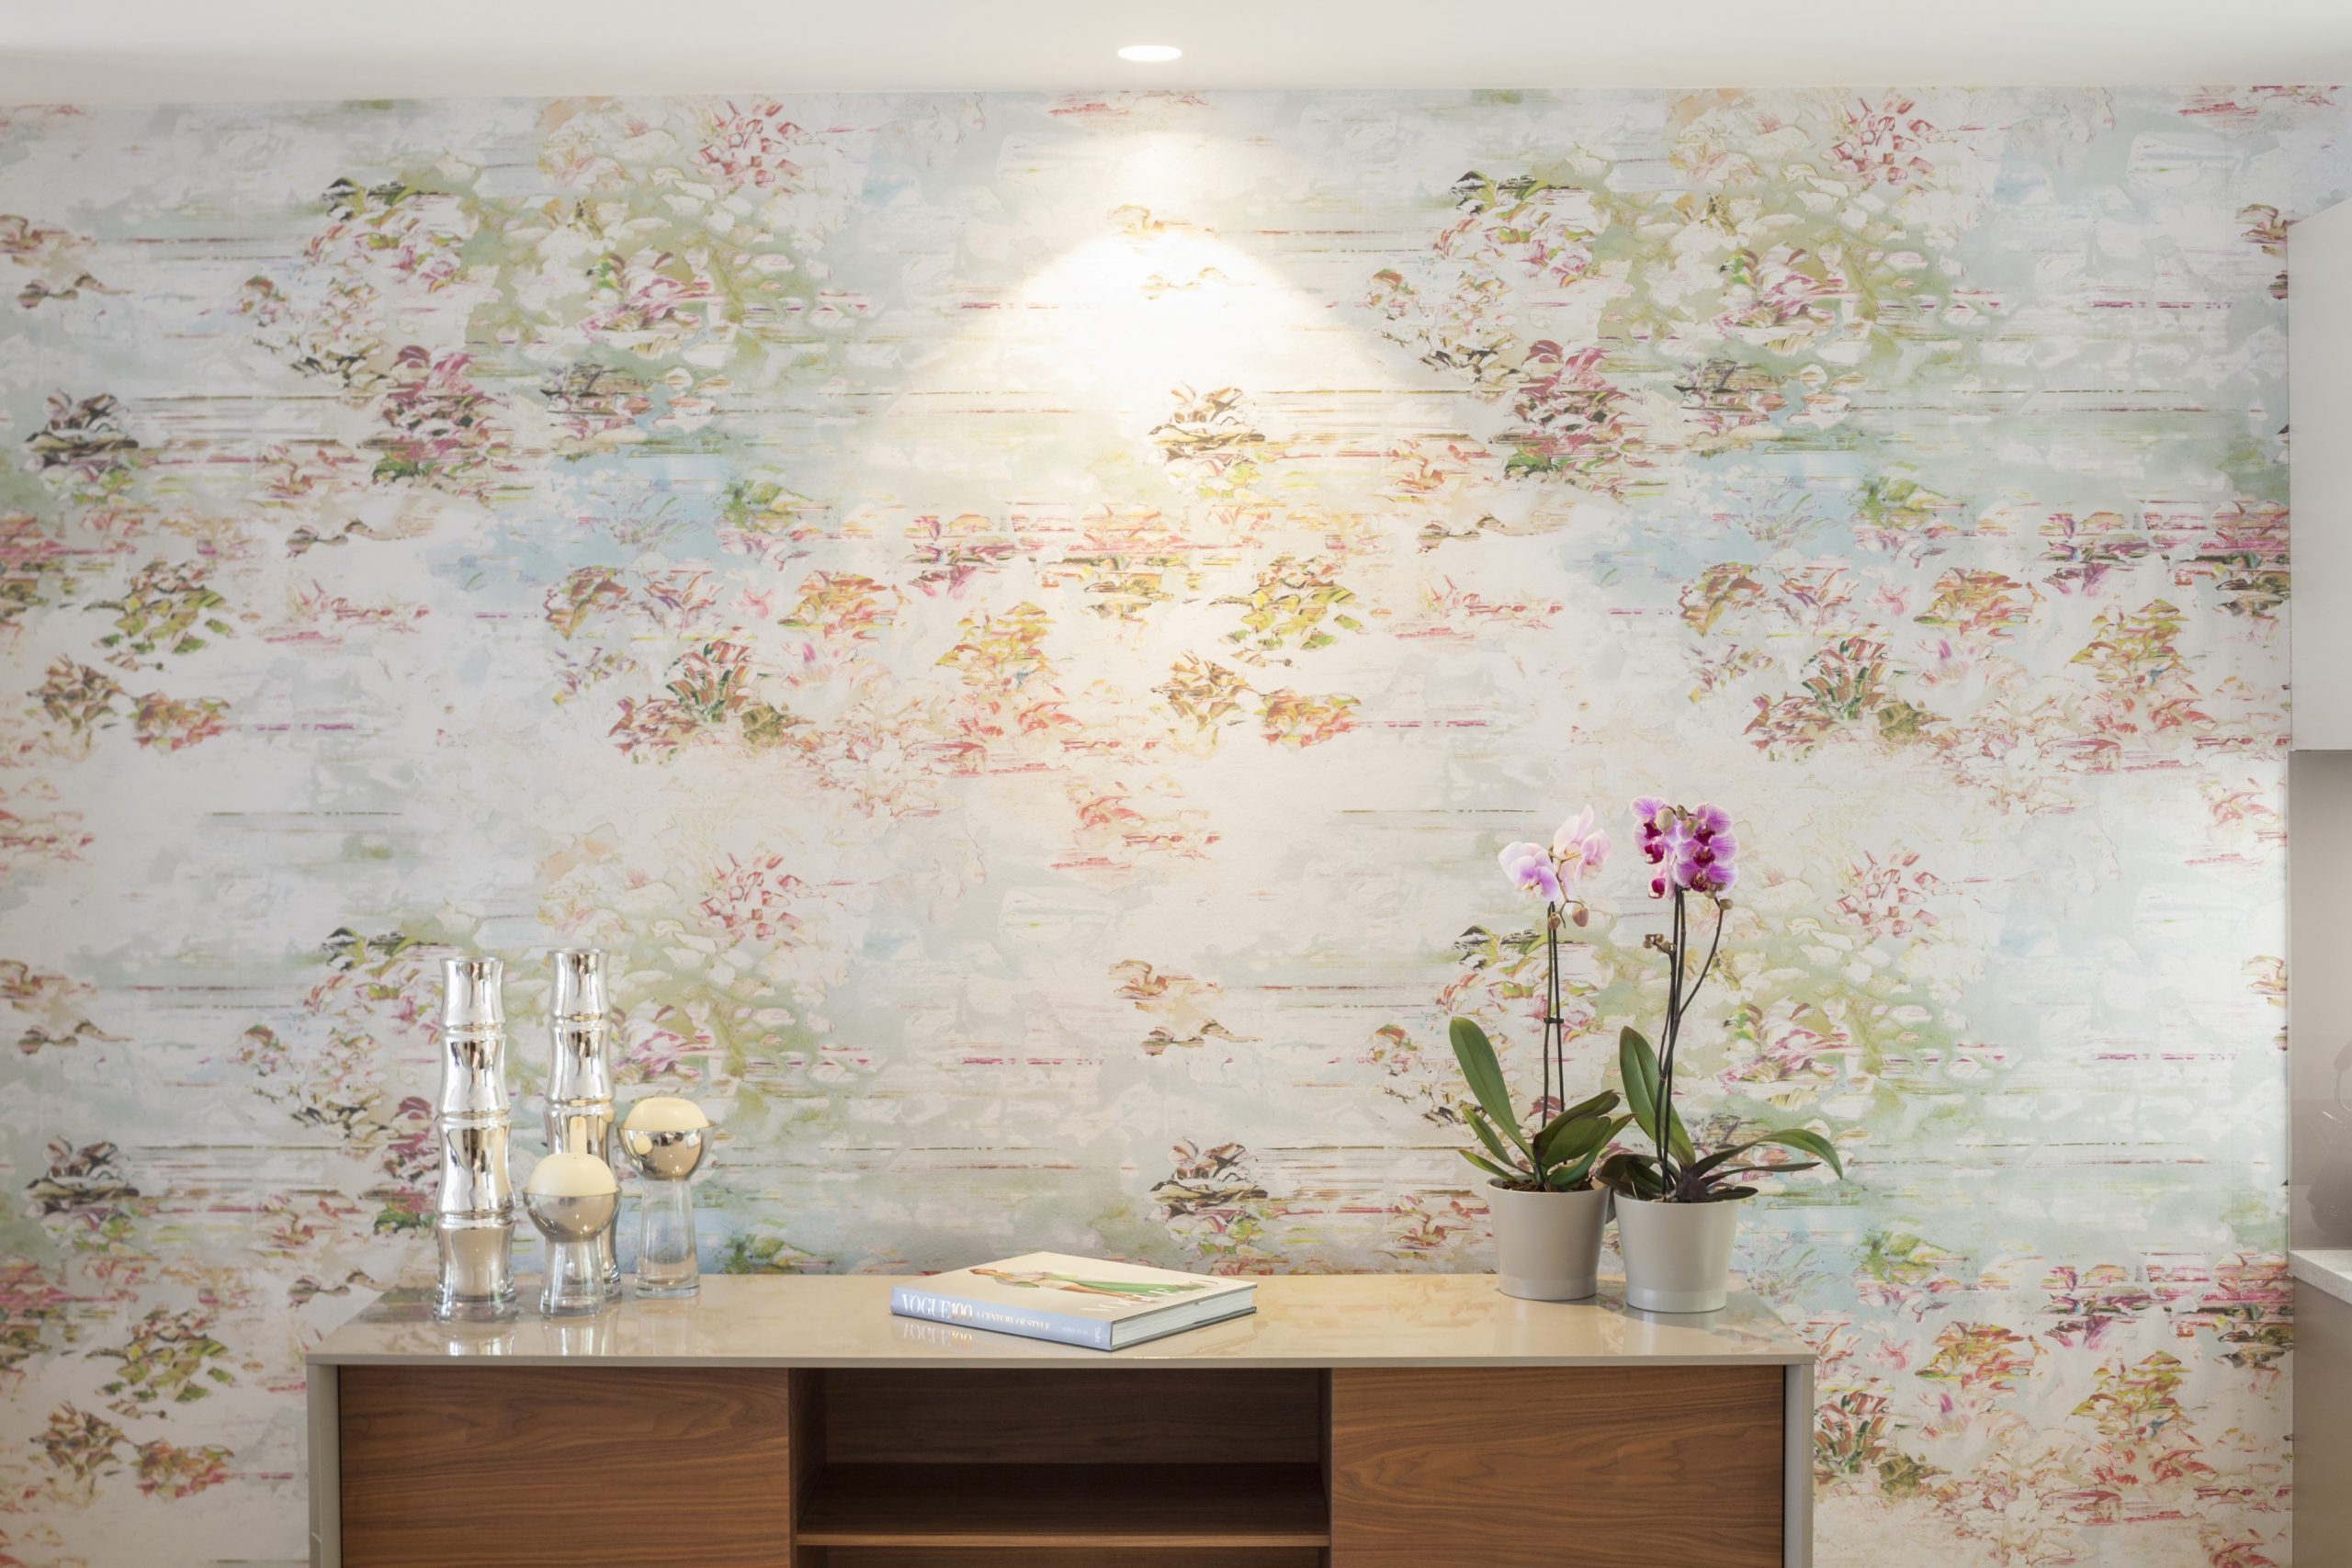 rjv-home-design-refurbishment-london-61141d37957d1